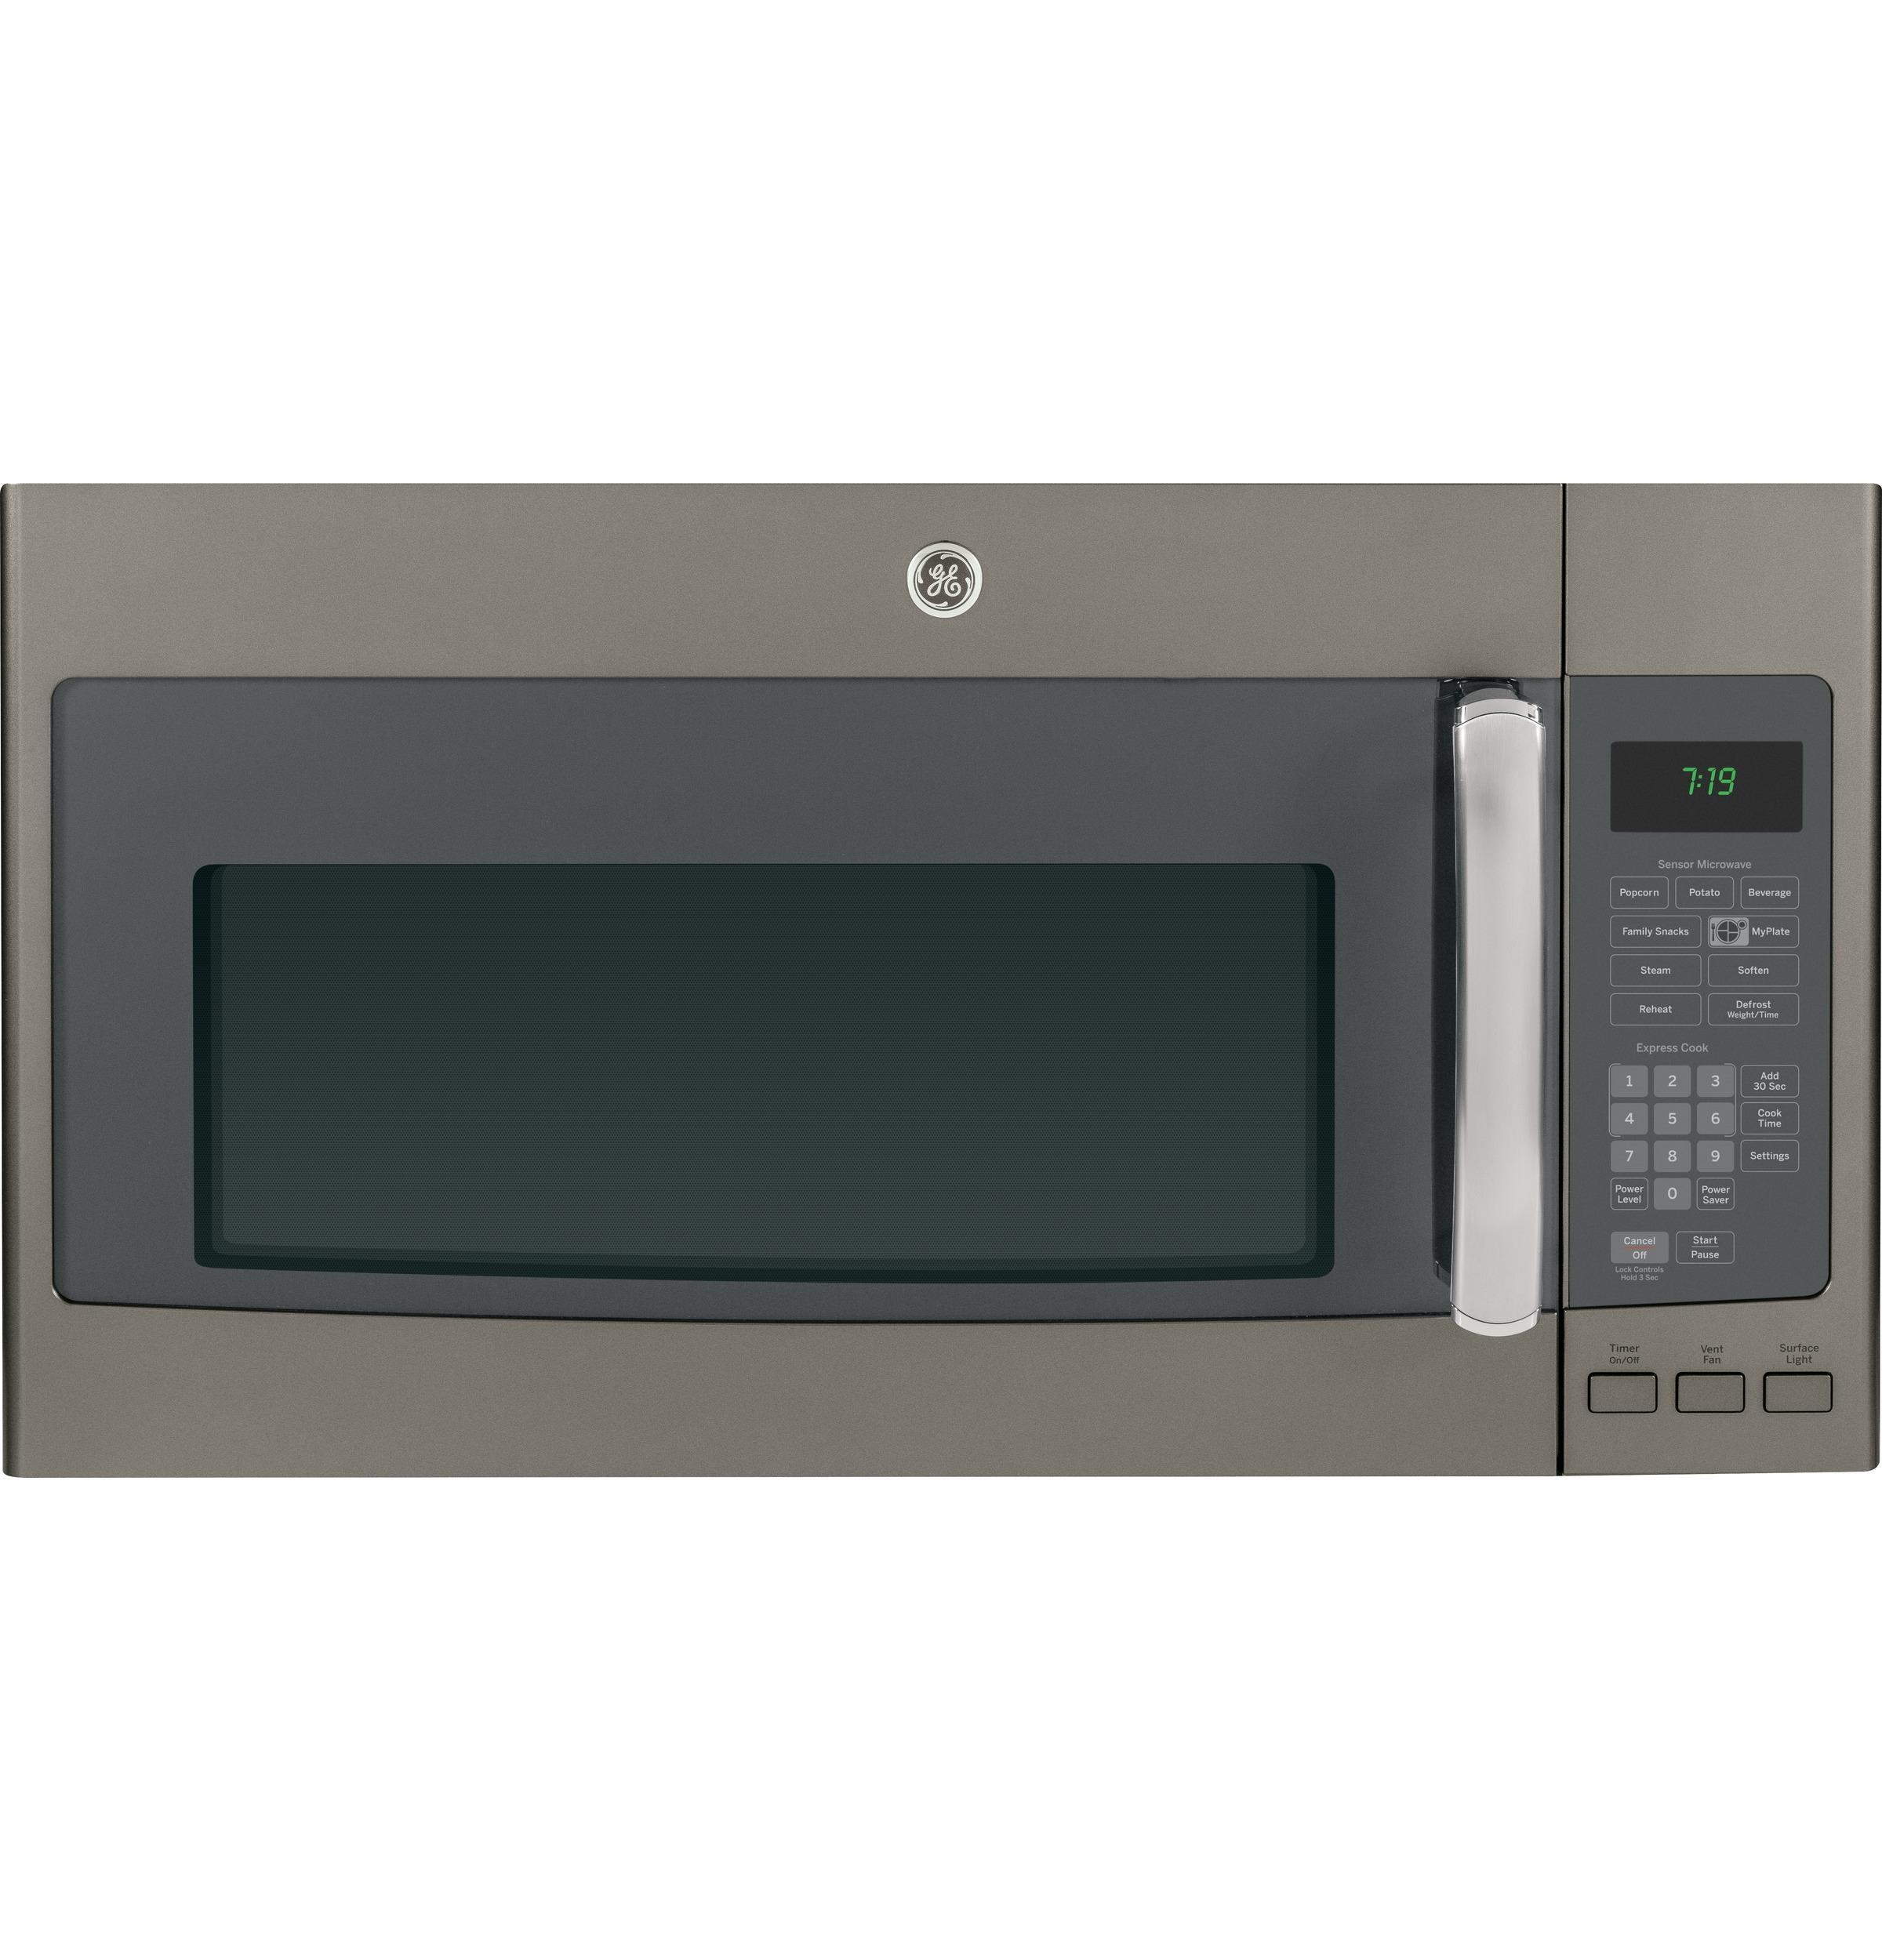 Ge Microwave Ovens ~ Jvm ge over the range microwaves